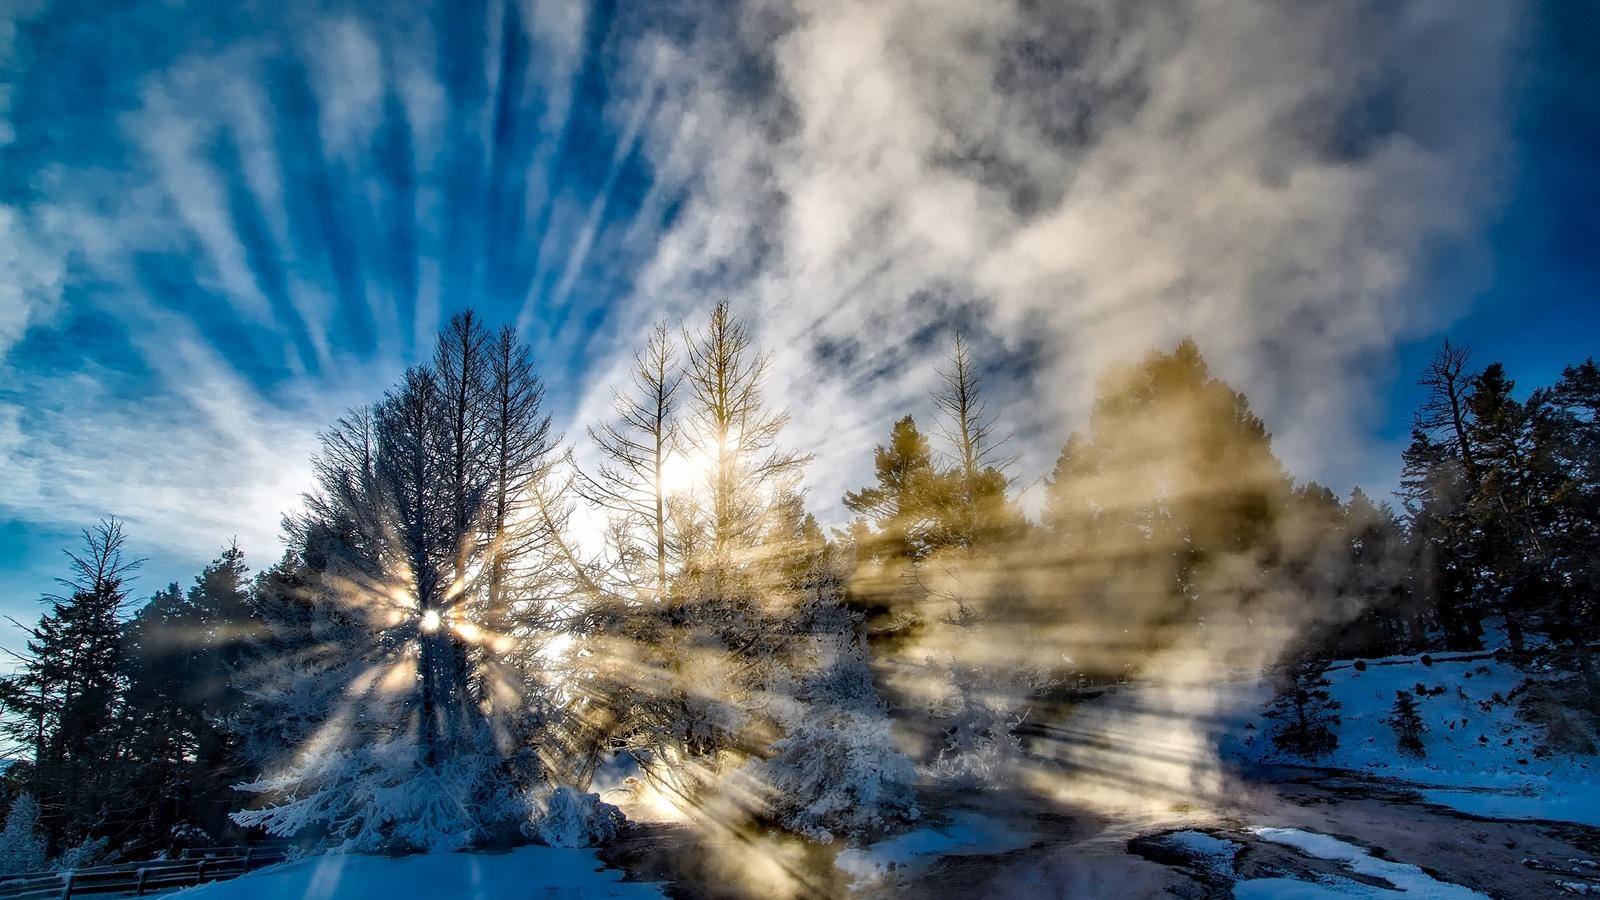 природа, пейзаж, зима, деревья, снег, солнце, лучи